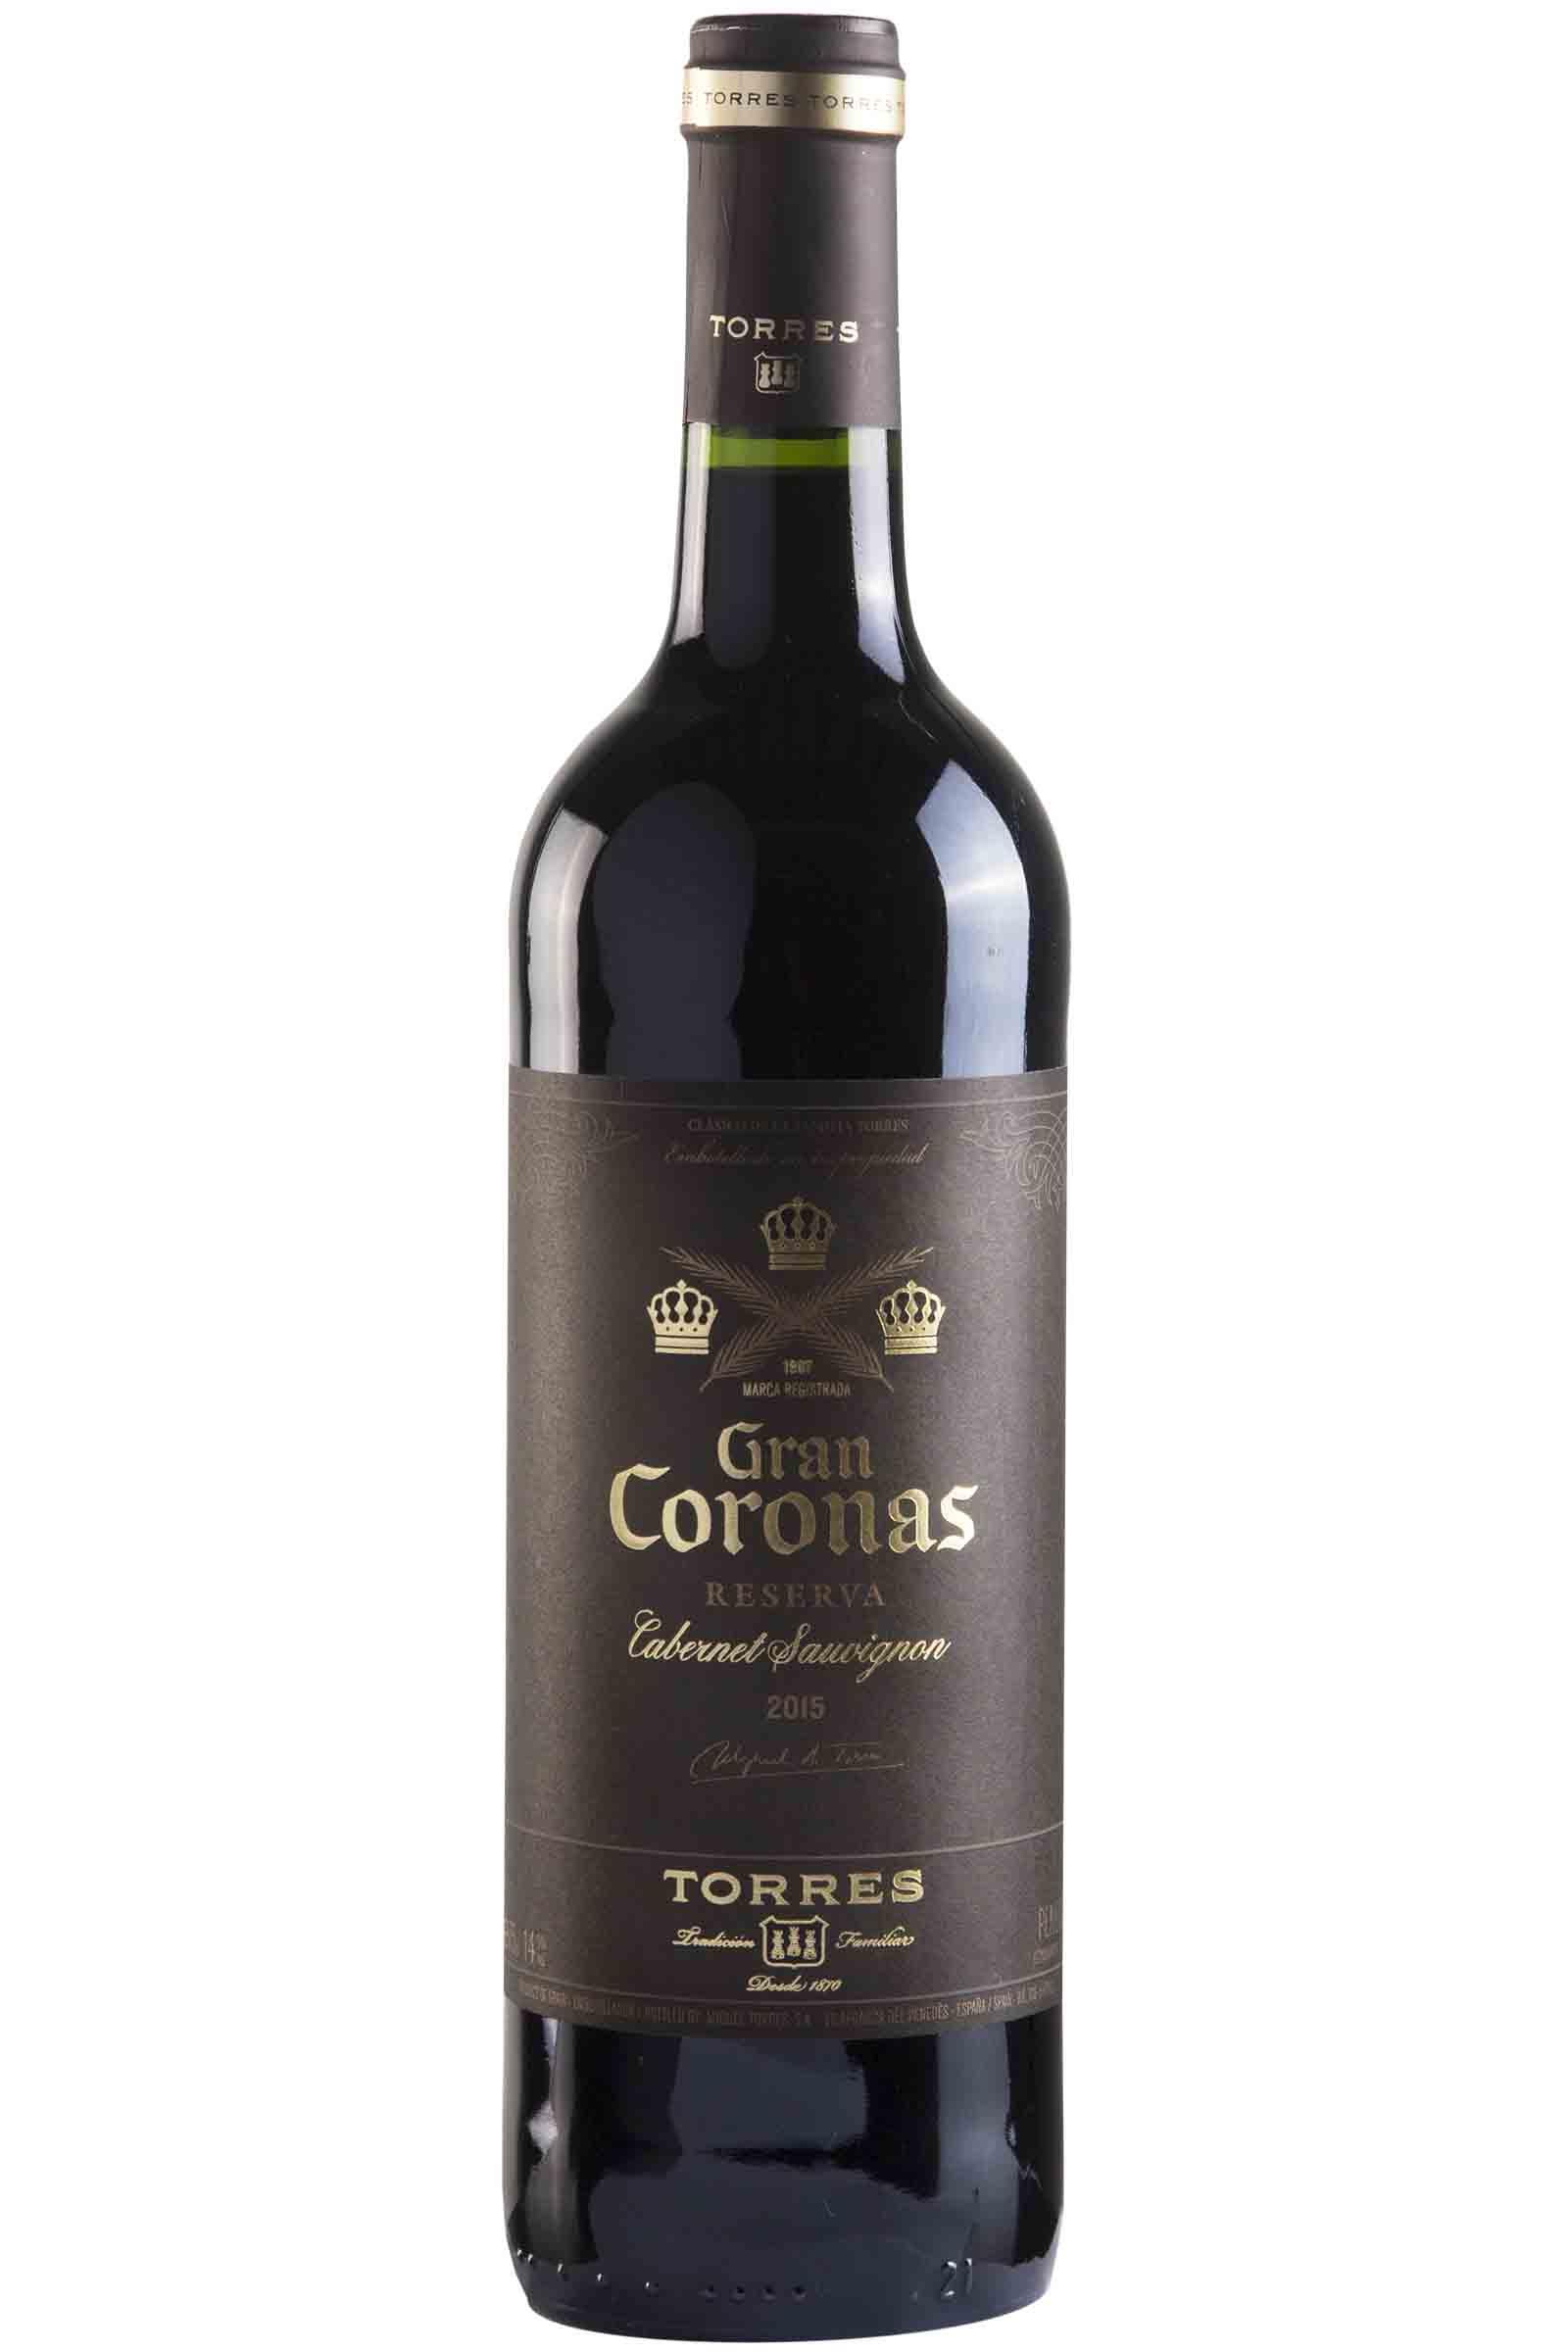 Vino Torres Gran Coronas 750ml